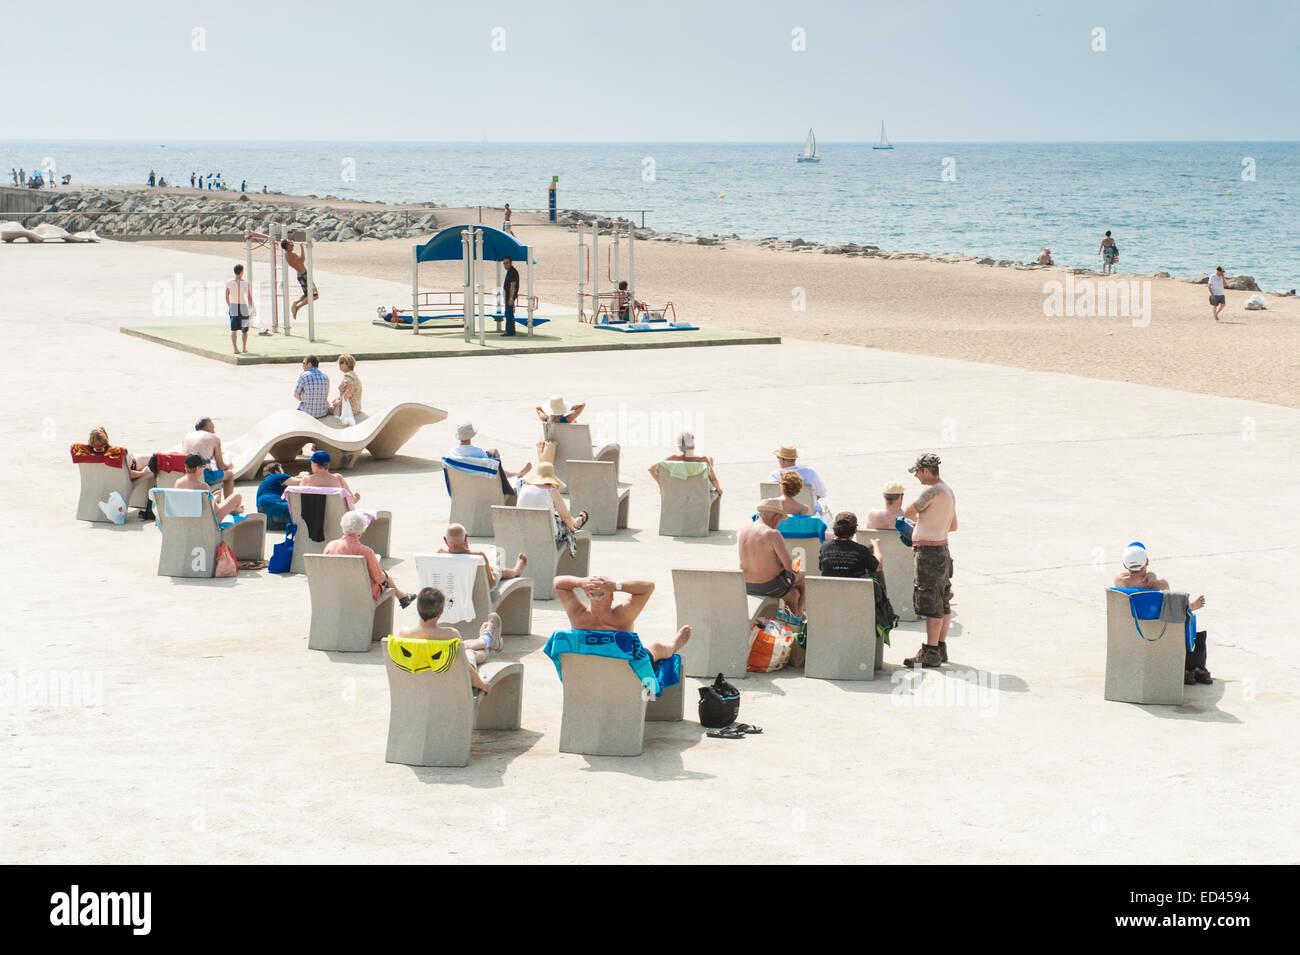 Barcelona city beach sunbathers sitting on cement sun loungers, Barcelona, Catalonia, Spain - Stock Image